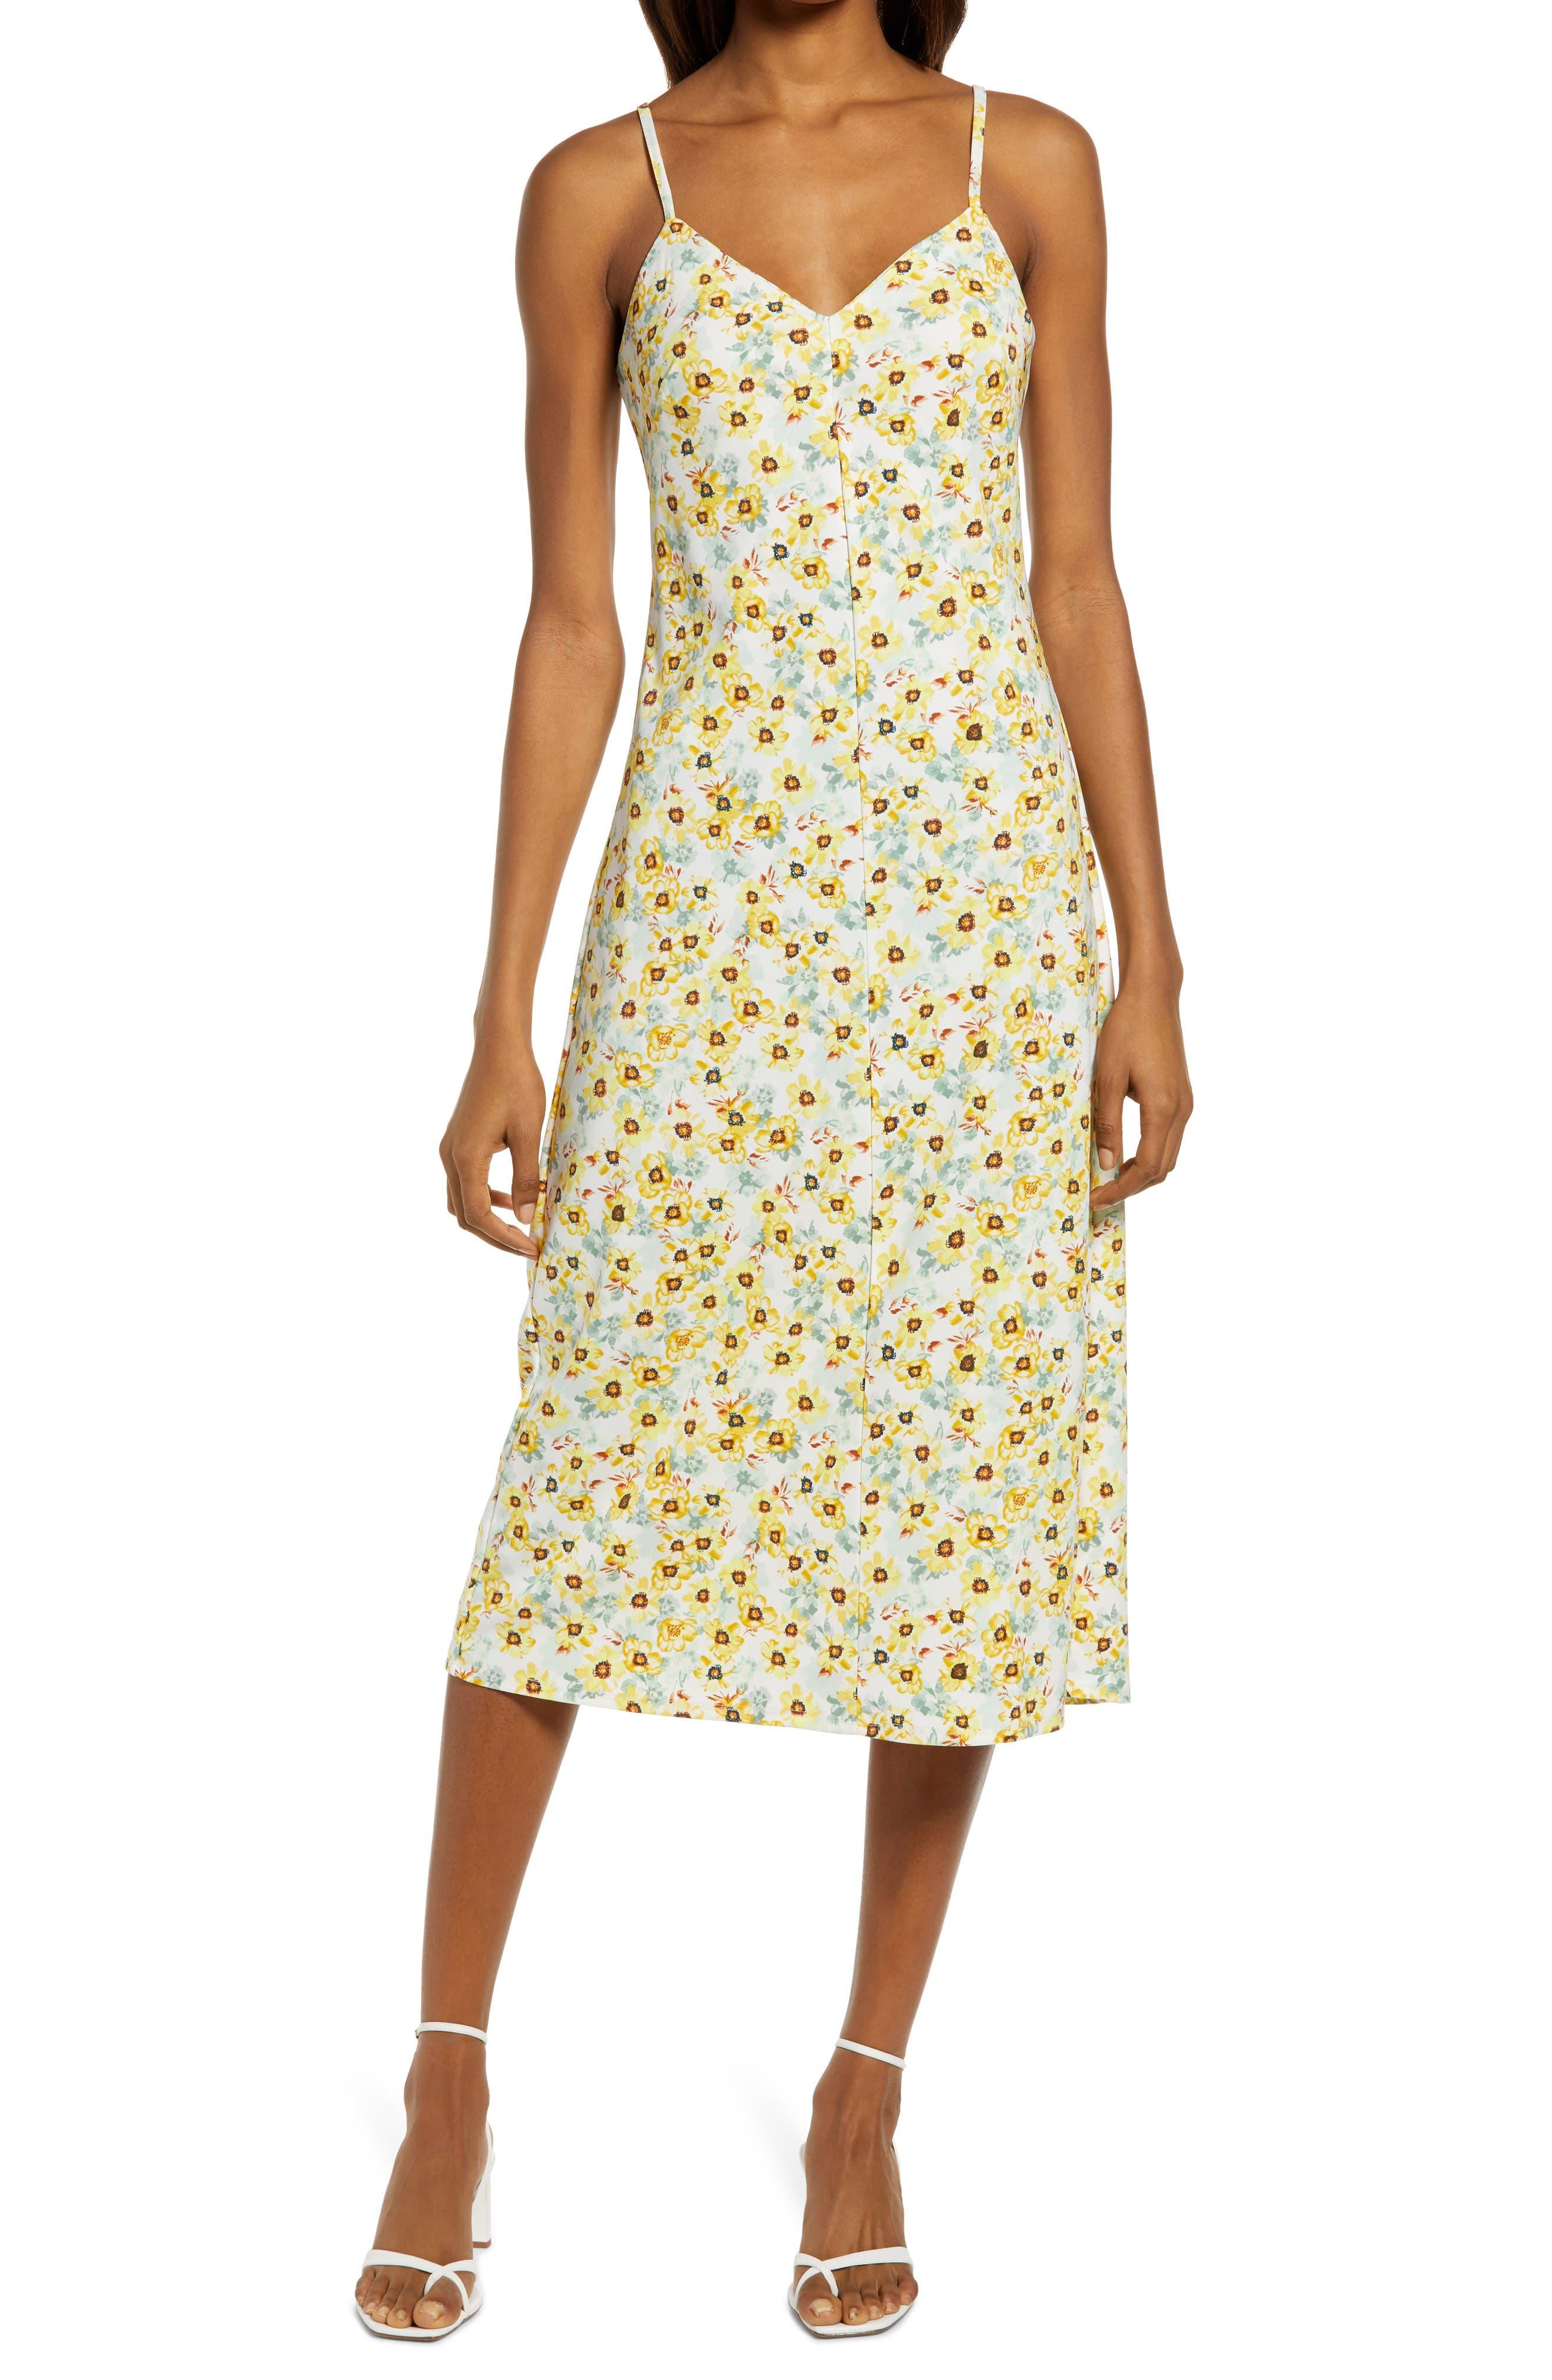 SALE Sweet Yellow Plaid dress Vintage scoop neck Tea dress blossom Yellow dress spring summer sundress bow dress SMALL